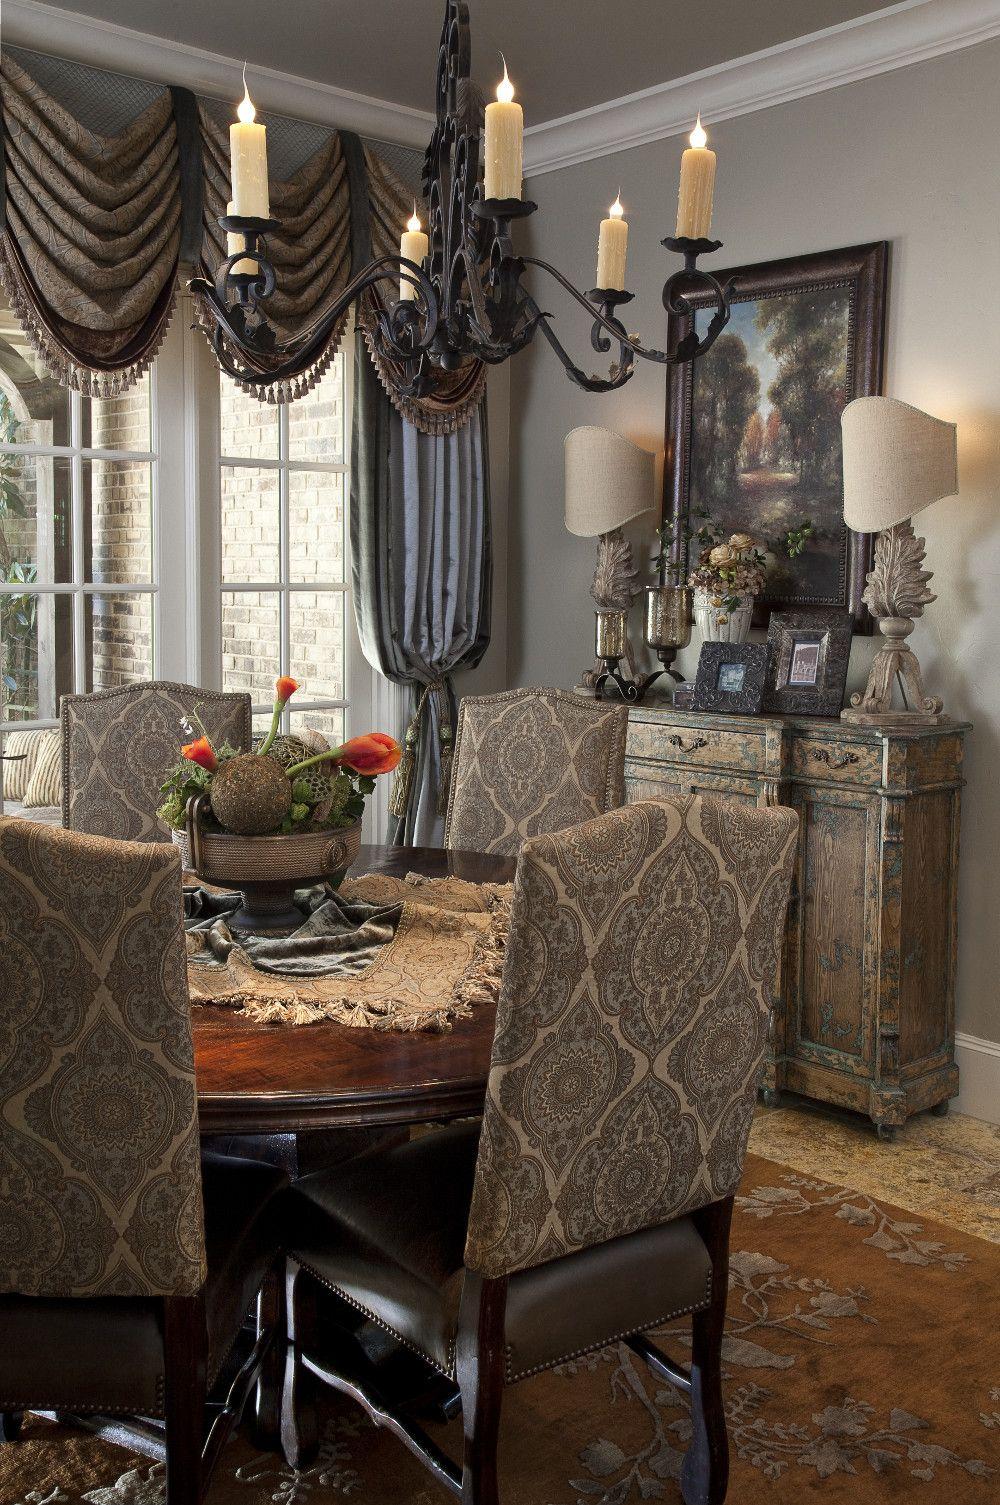 In The Details Grandeur Design Tuscan Dining Rooms Mediterranean Home Decor Home Decor